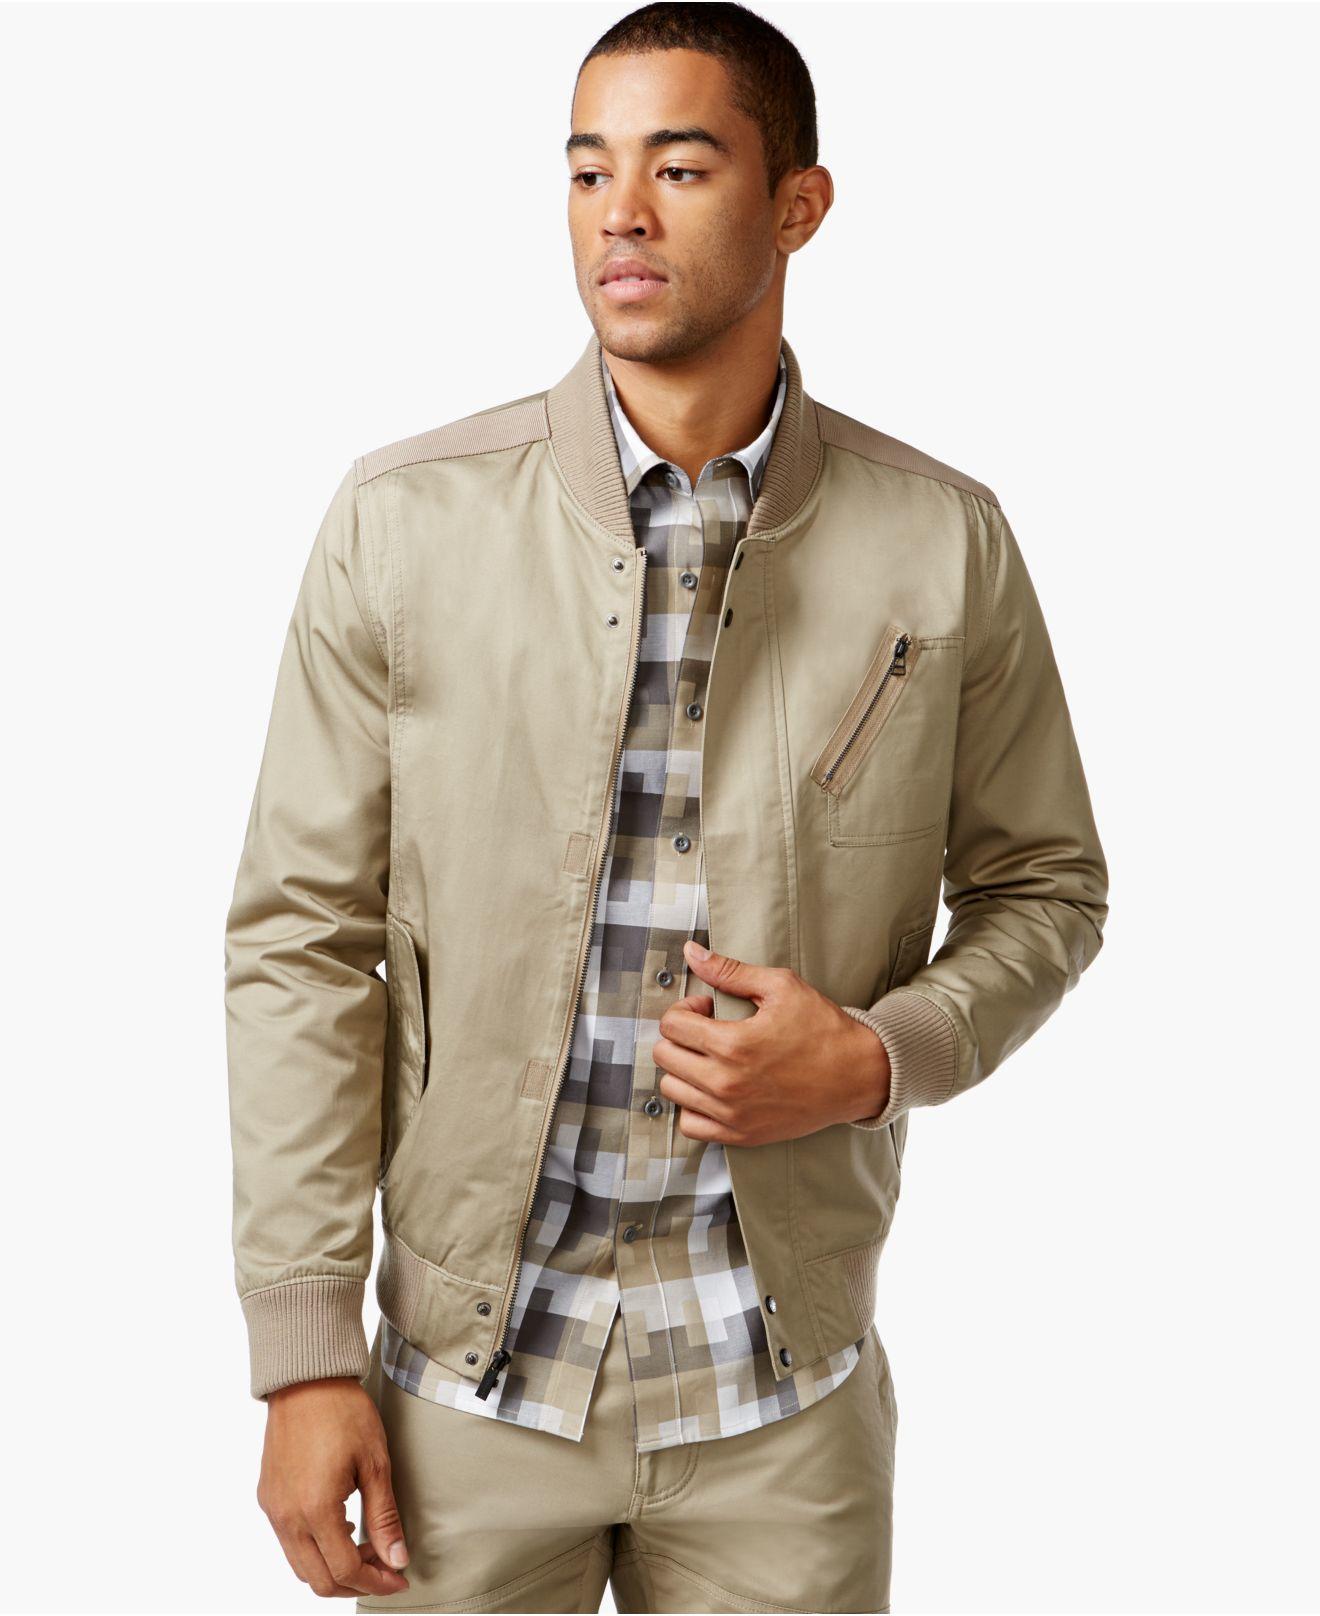 Lyst sean john utility jacket in natural for men for Sean john t shirts for mens